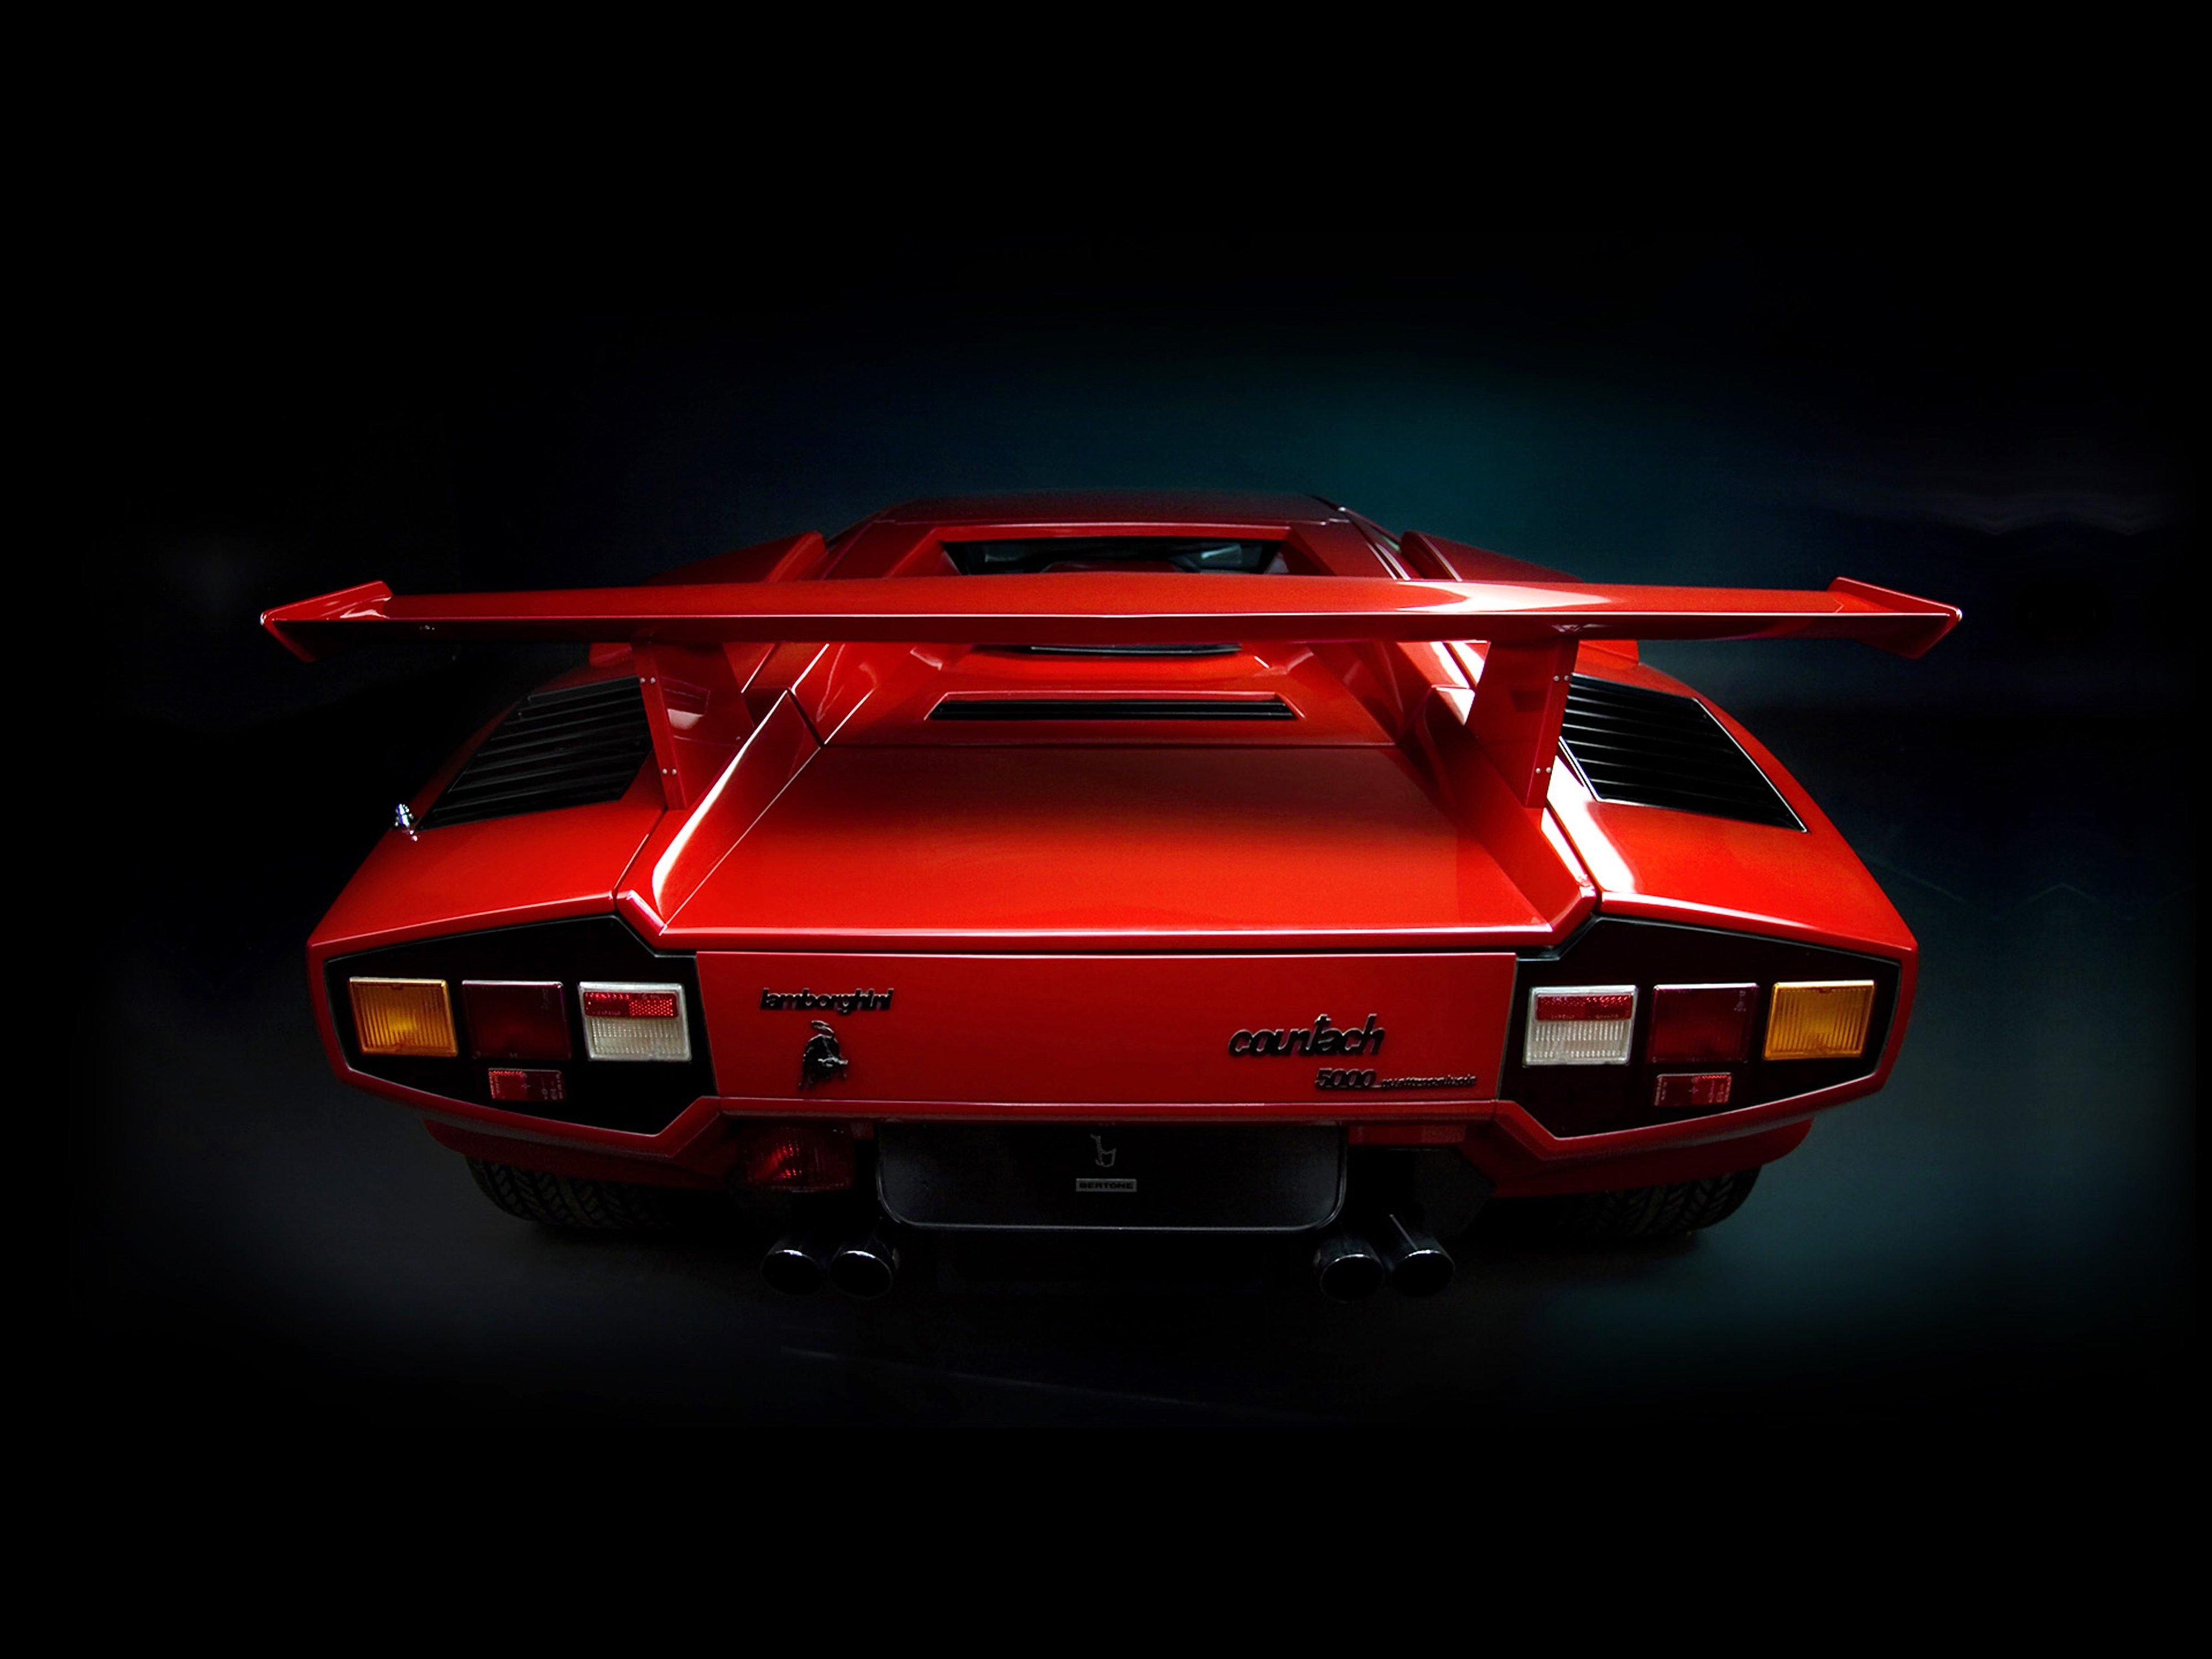 1985 lamborghini countach 5000 quattrovalvole supercar italy sportcar vehicle car 4000x3000 5. Black Bedroom Furniture Sets. Home Design Ideas